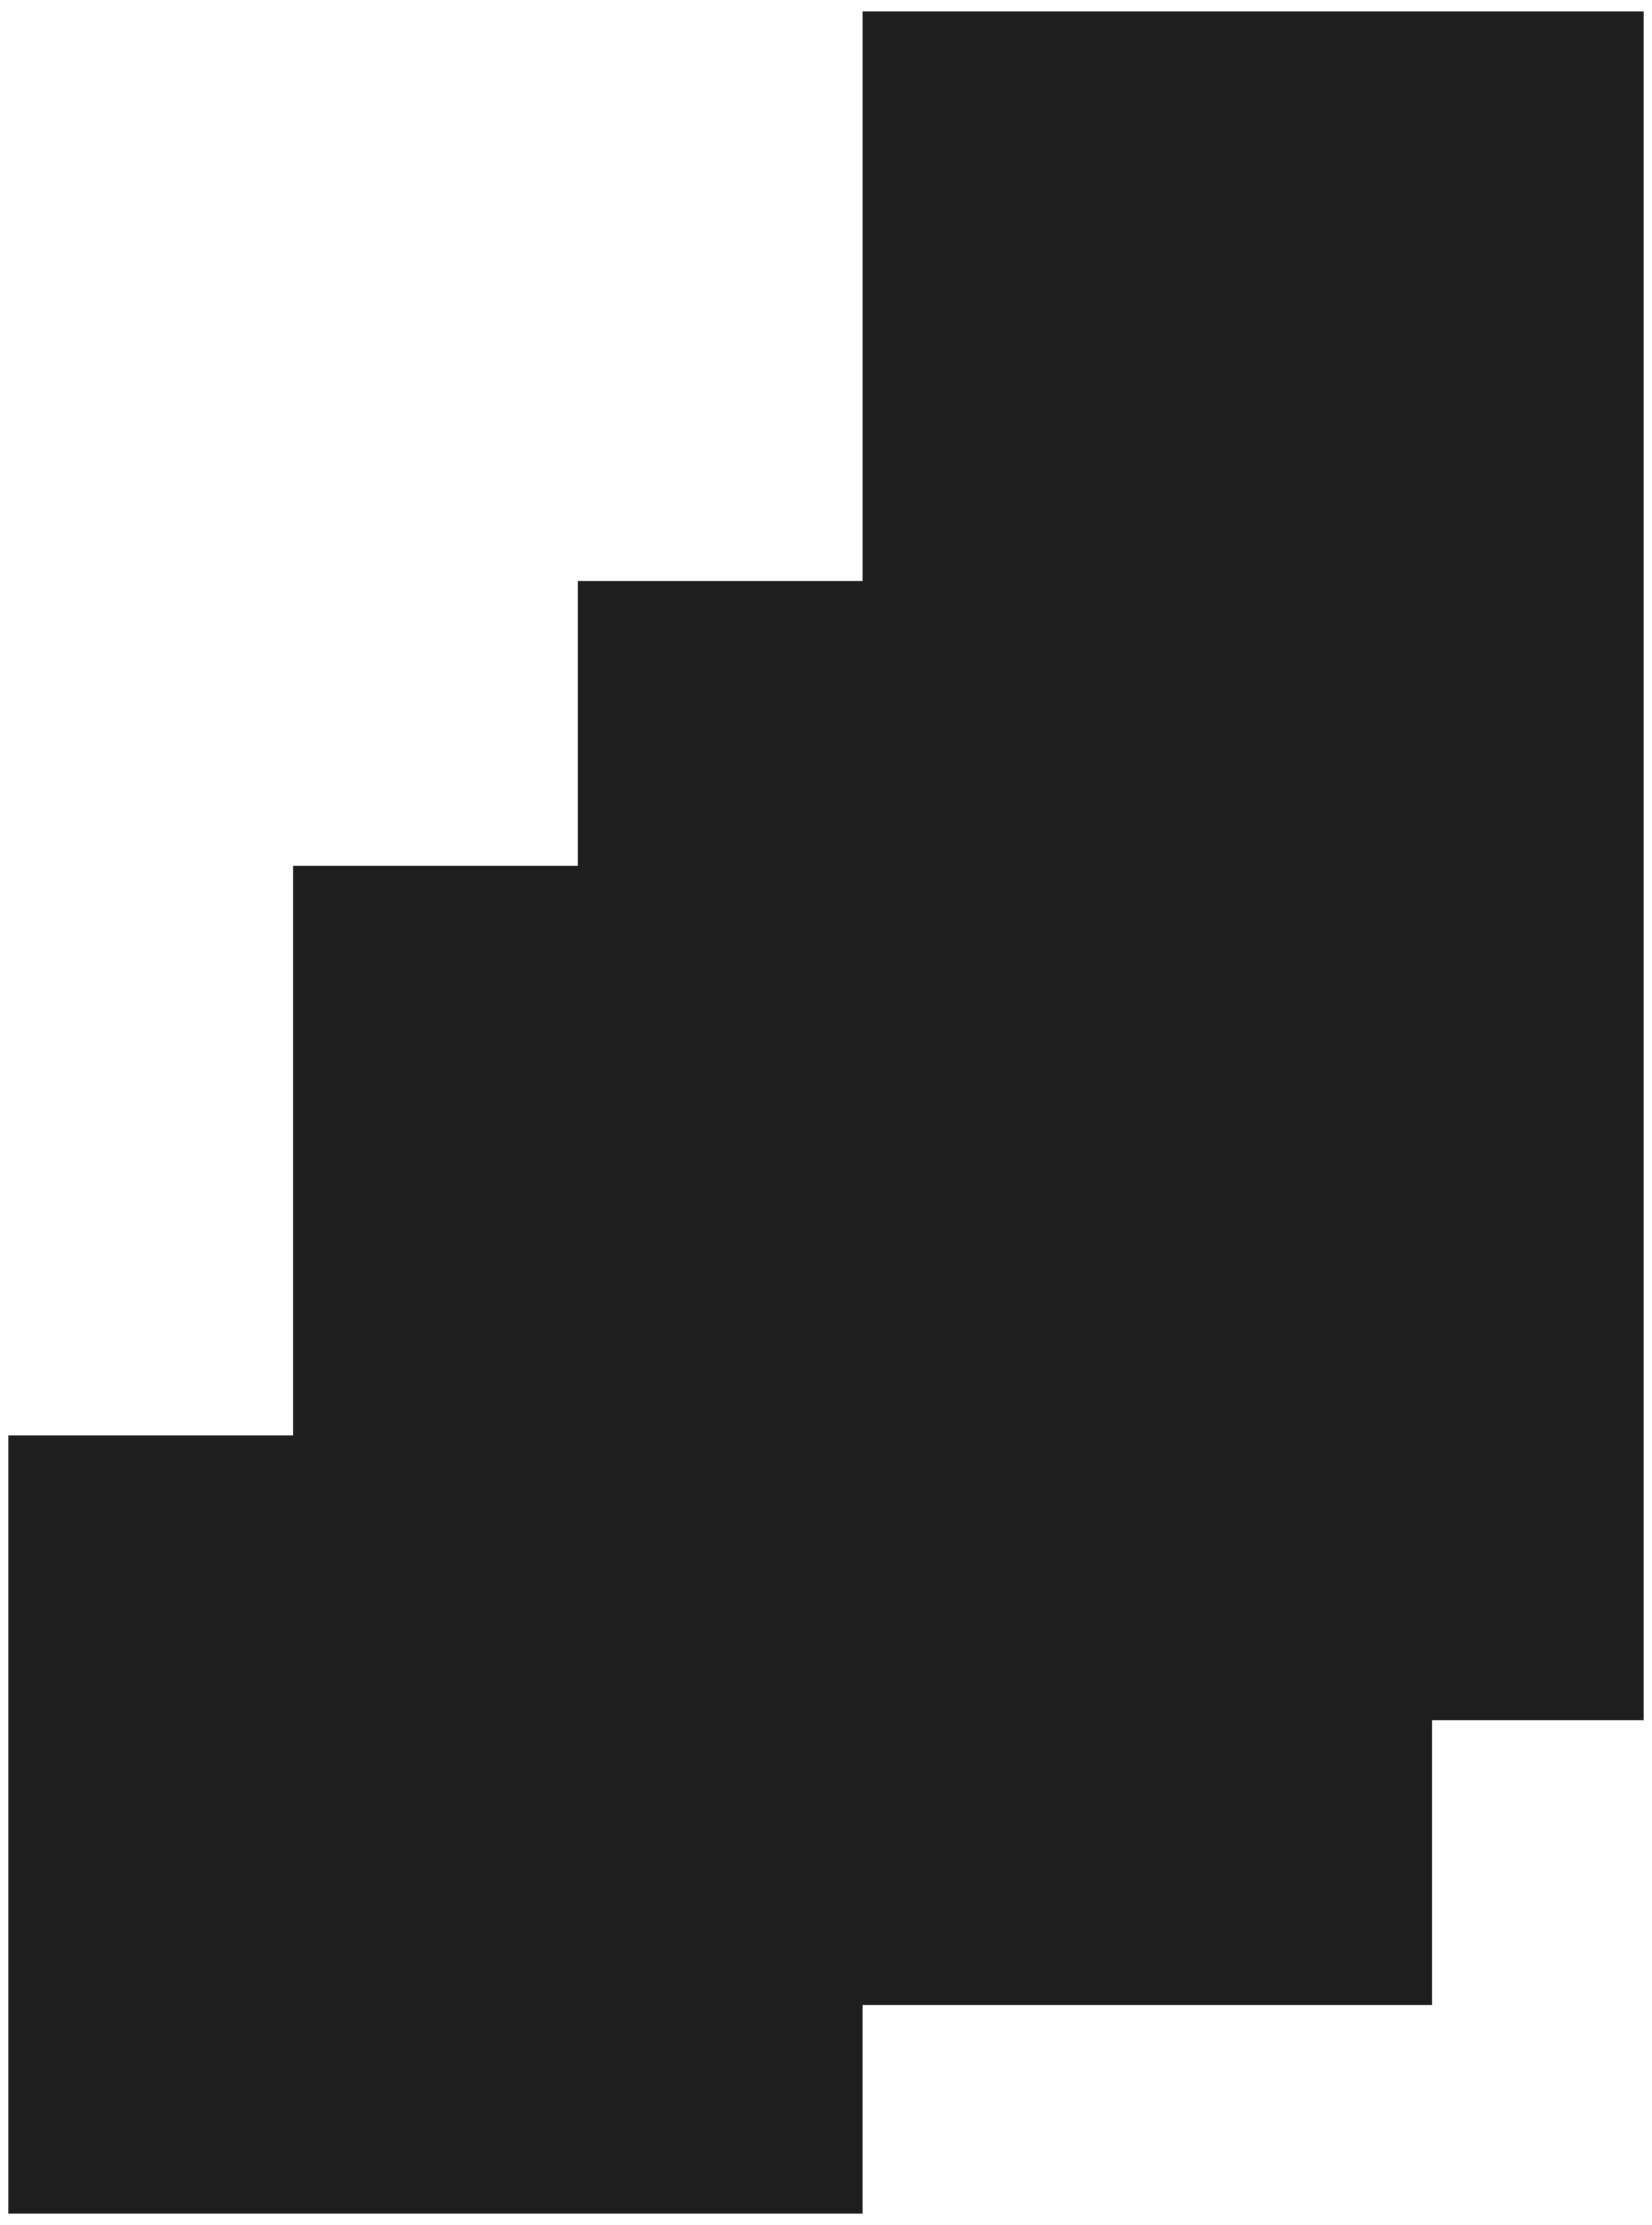 Image file formats Lossless compression - Flying Eagle PNG ... - Flying Eagle Vector Art